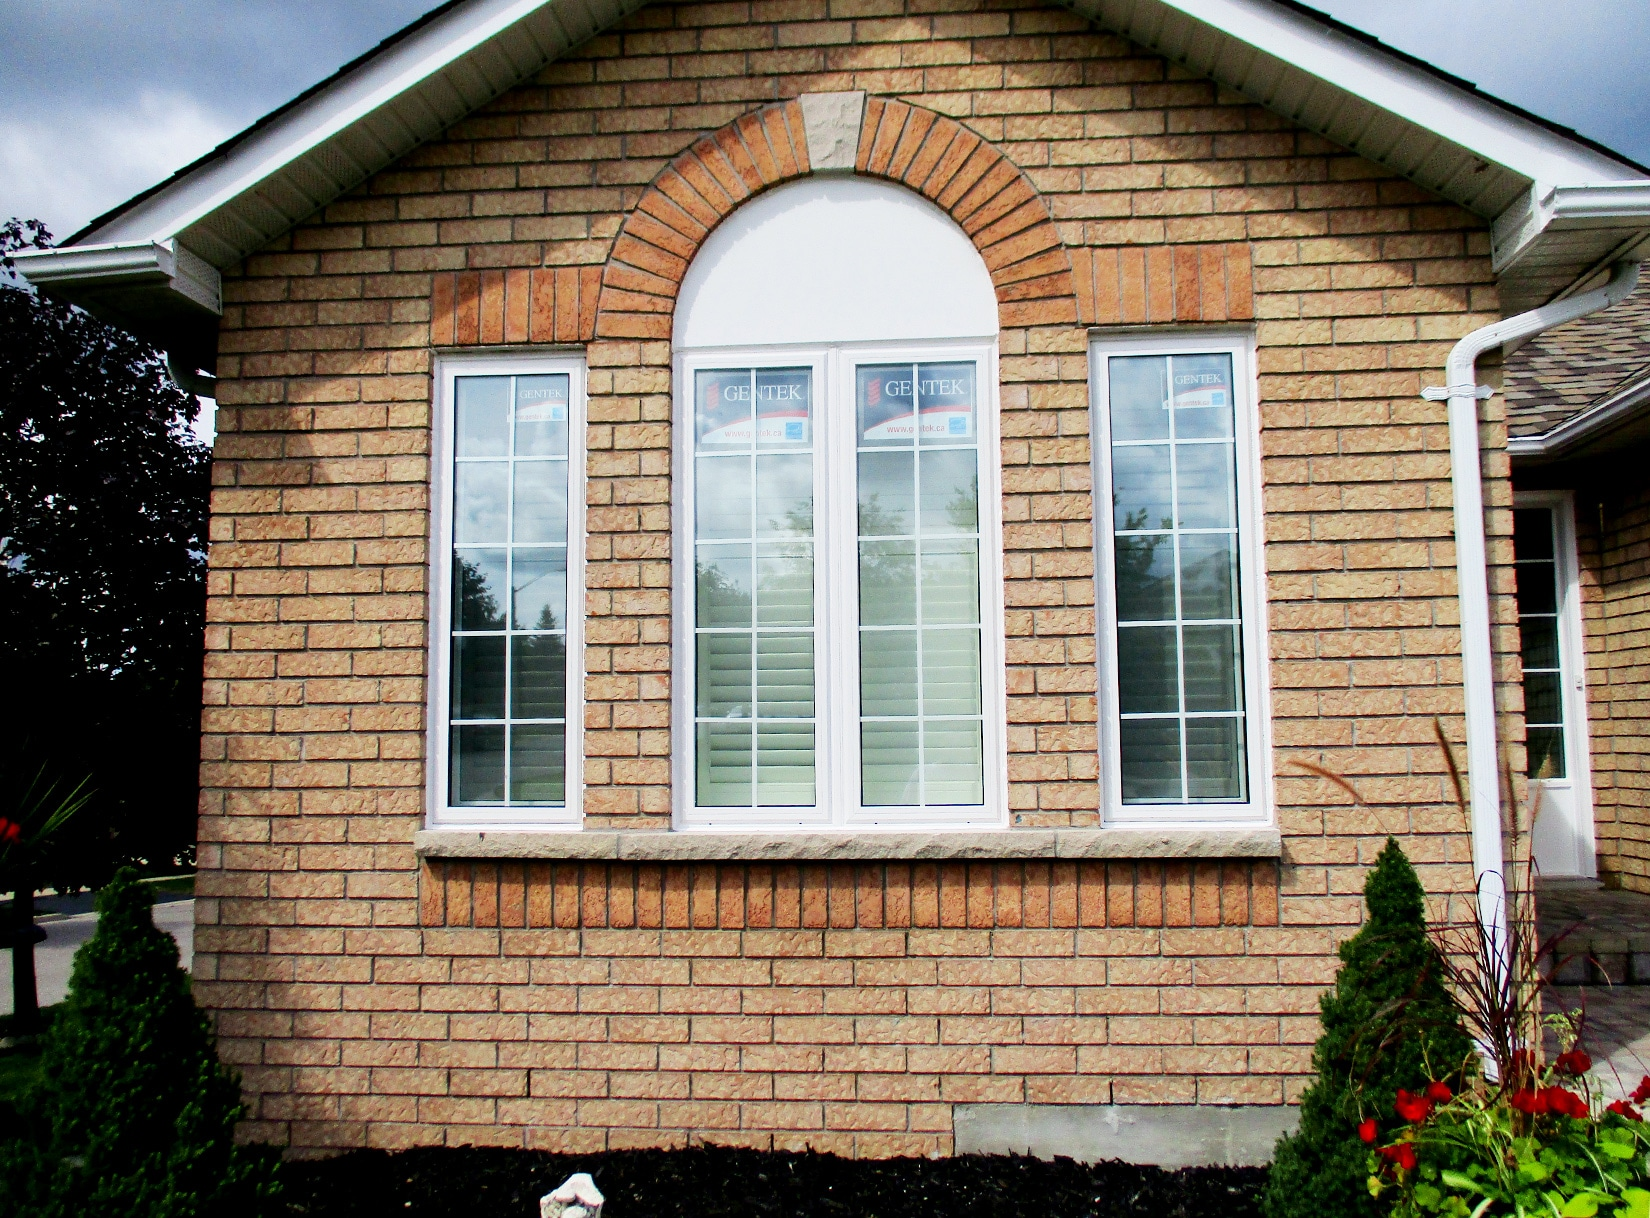 Intricate Indiana Limestone Repair | jan31 after | Weaver Exterior Remodeling Barrie